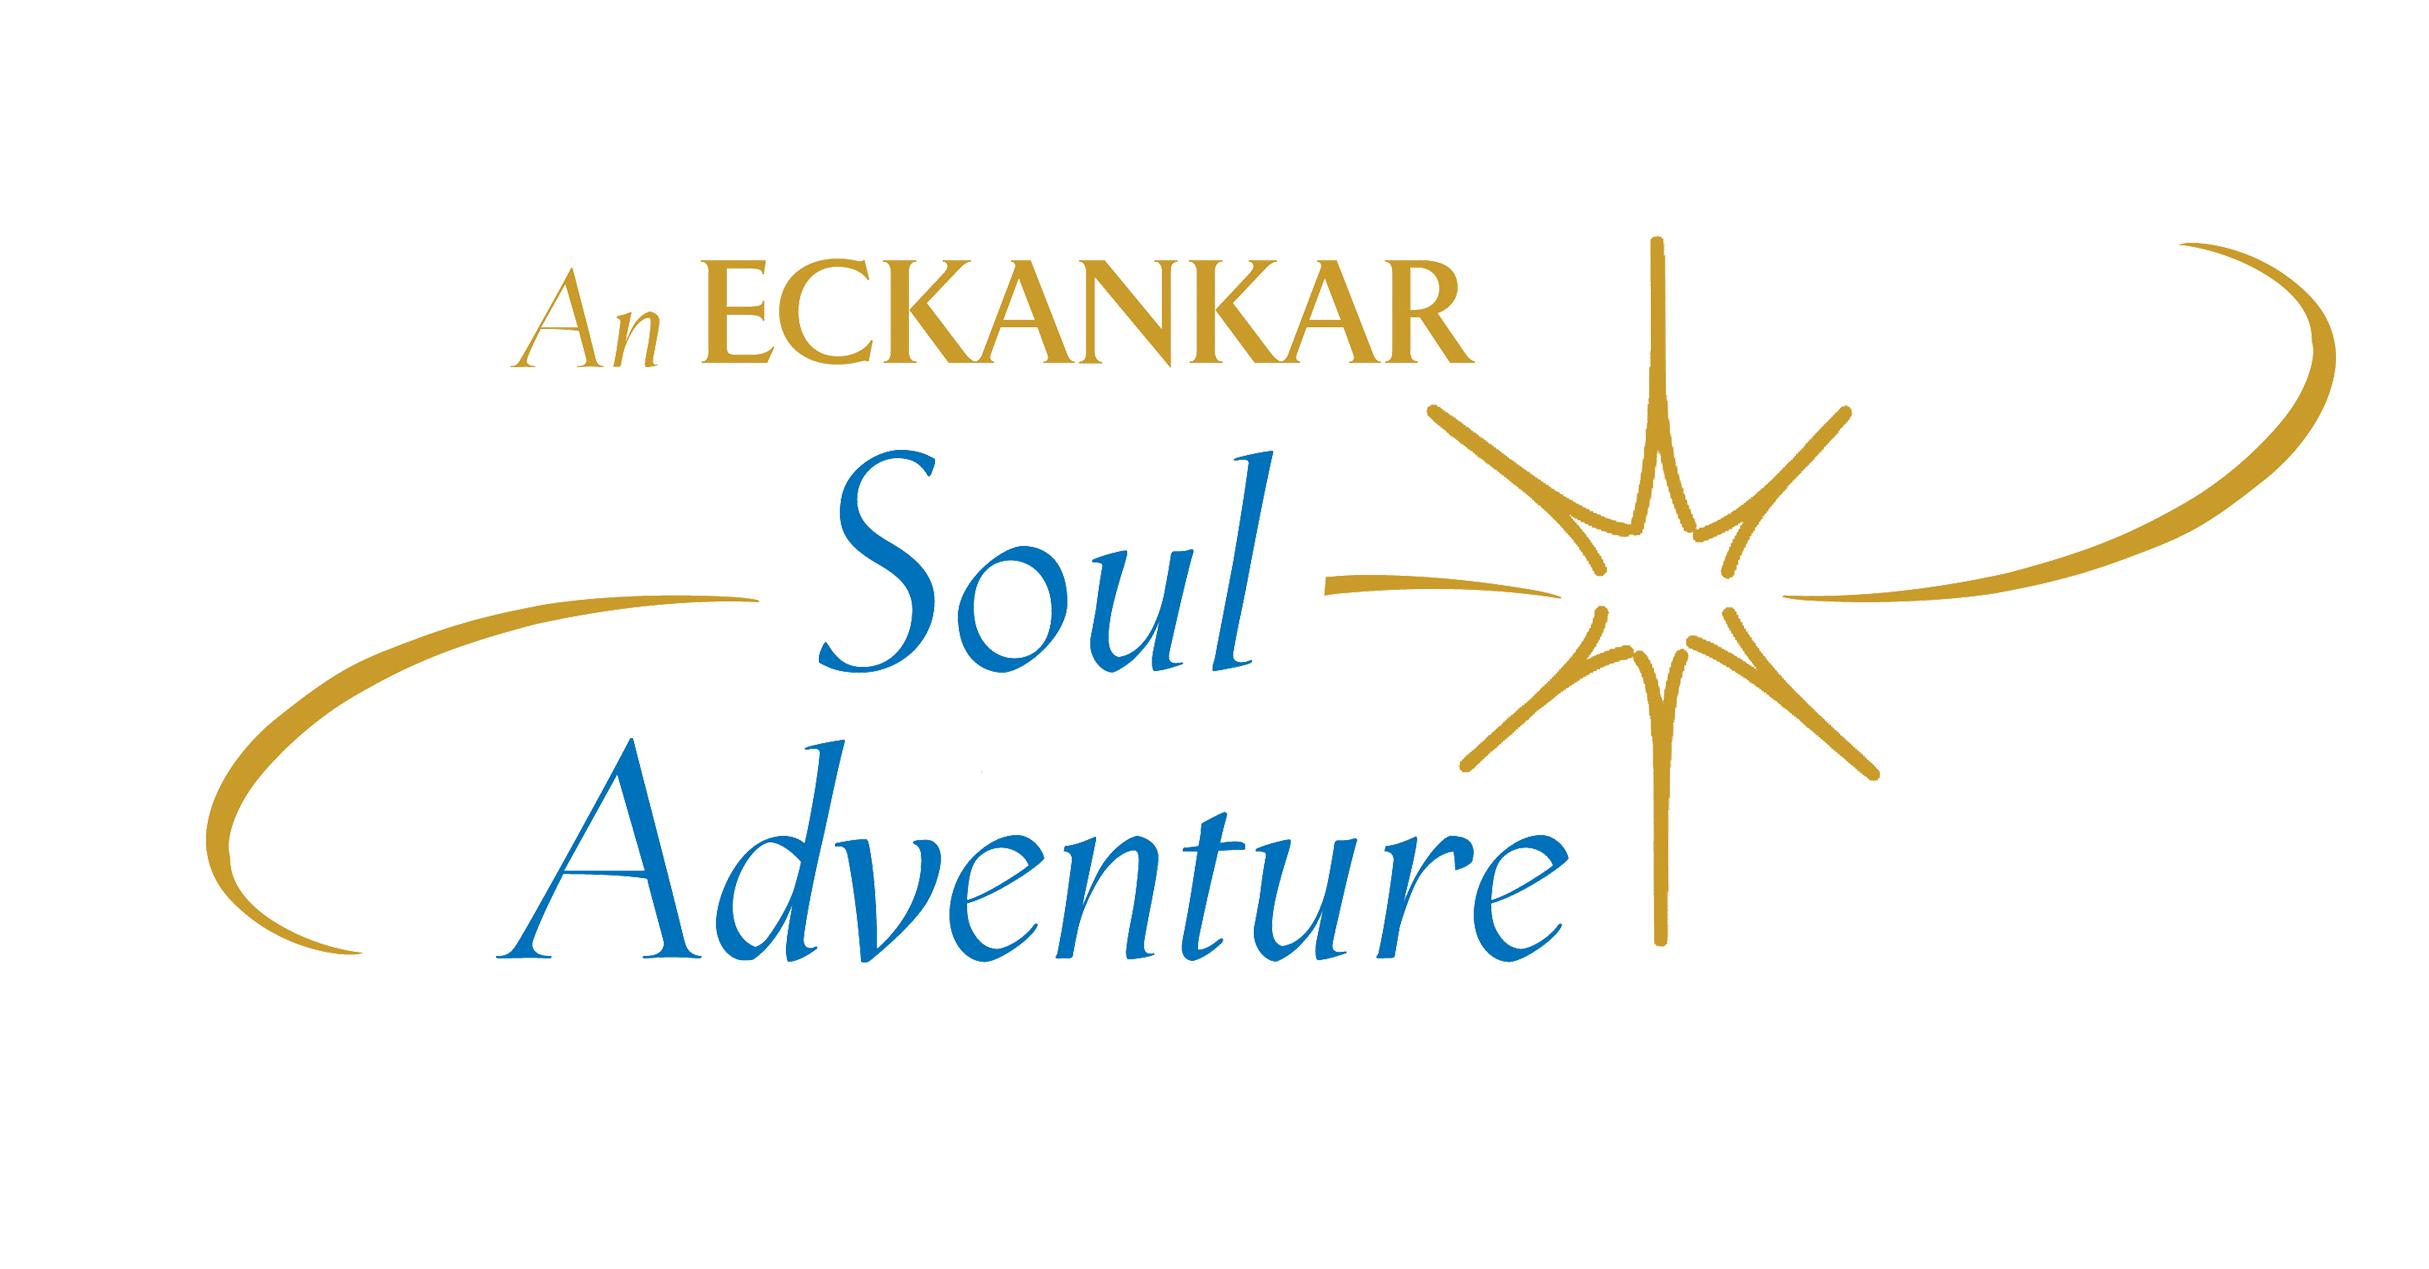 www.eckankar.org